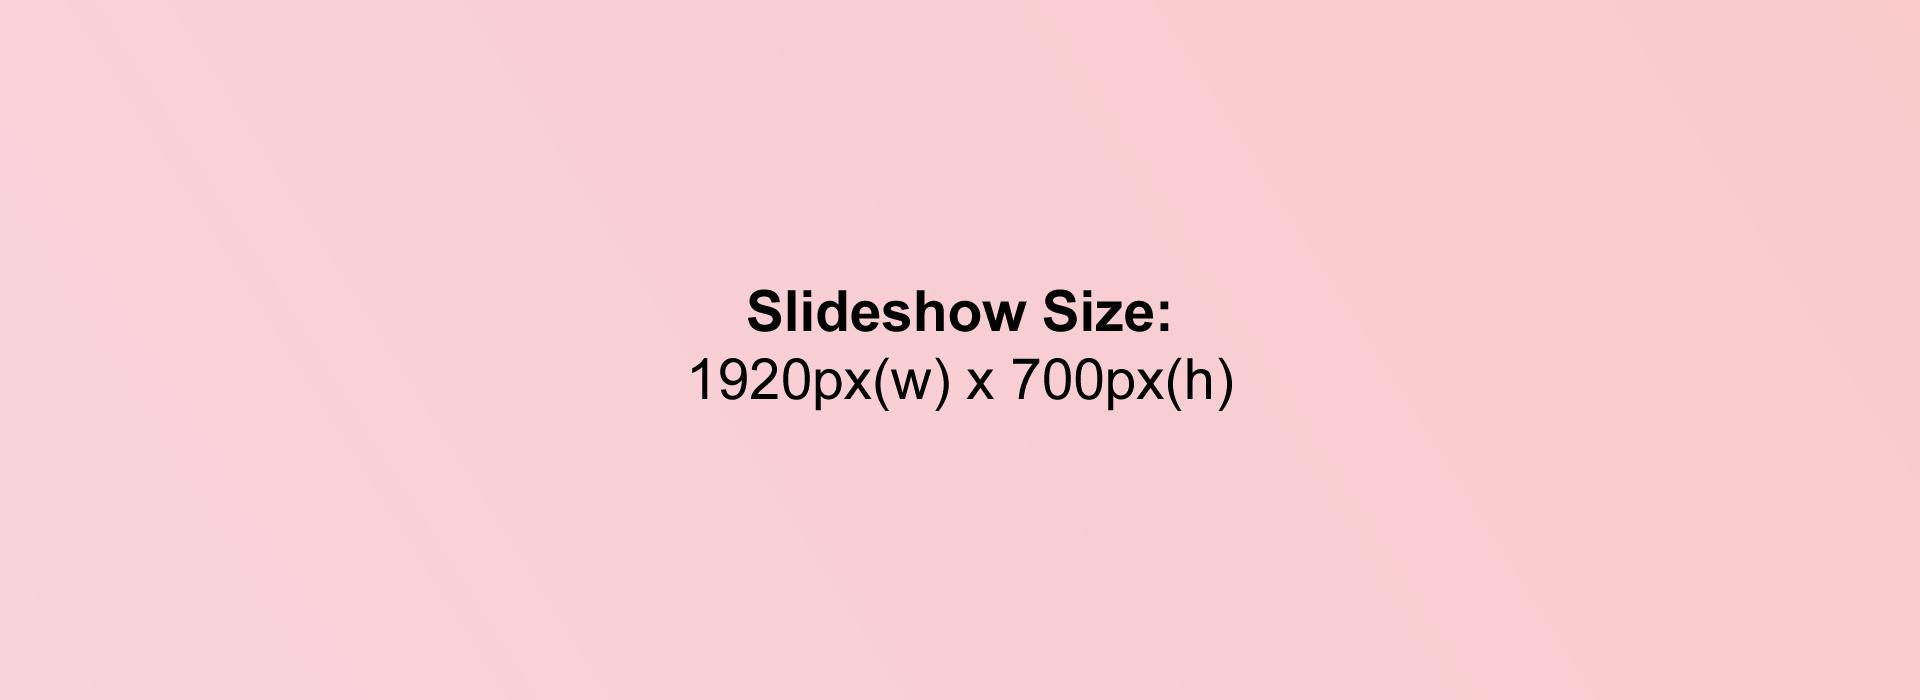 Slideshow size